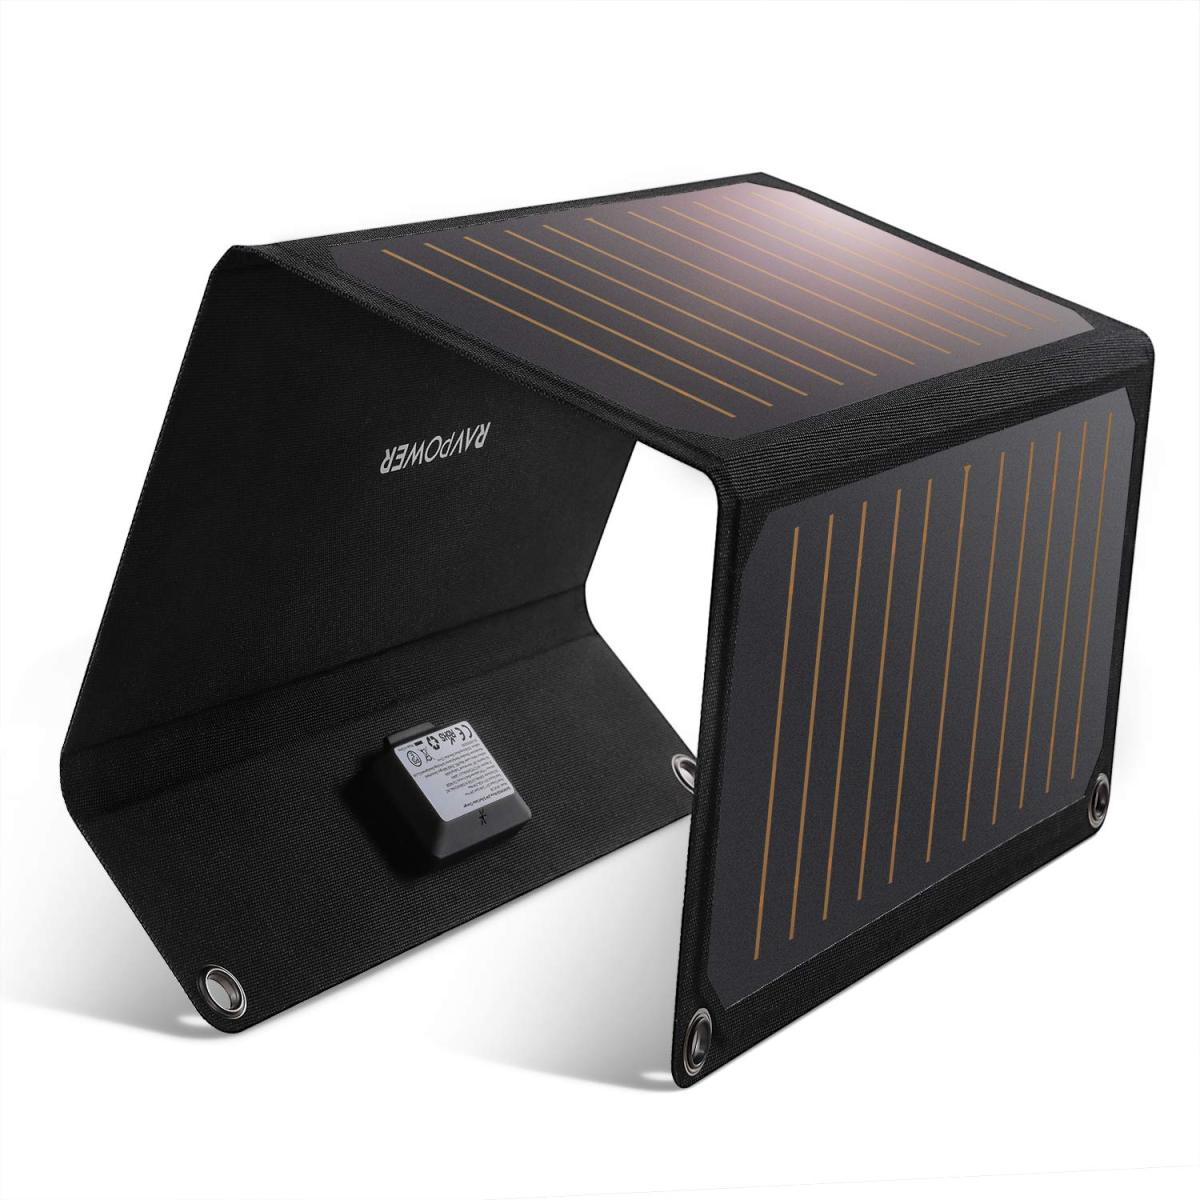 RAVPower ソーラーチャージャー 21W ソーラー充電器 ソーラーパネル 2ポート iPhone XR/XS/XS Max/iPad/Xperia/Android各種対応 防災 キャンプ アウトドア用 RP-